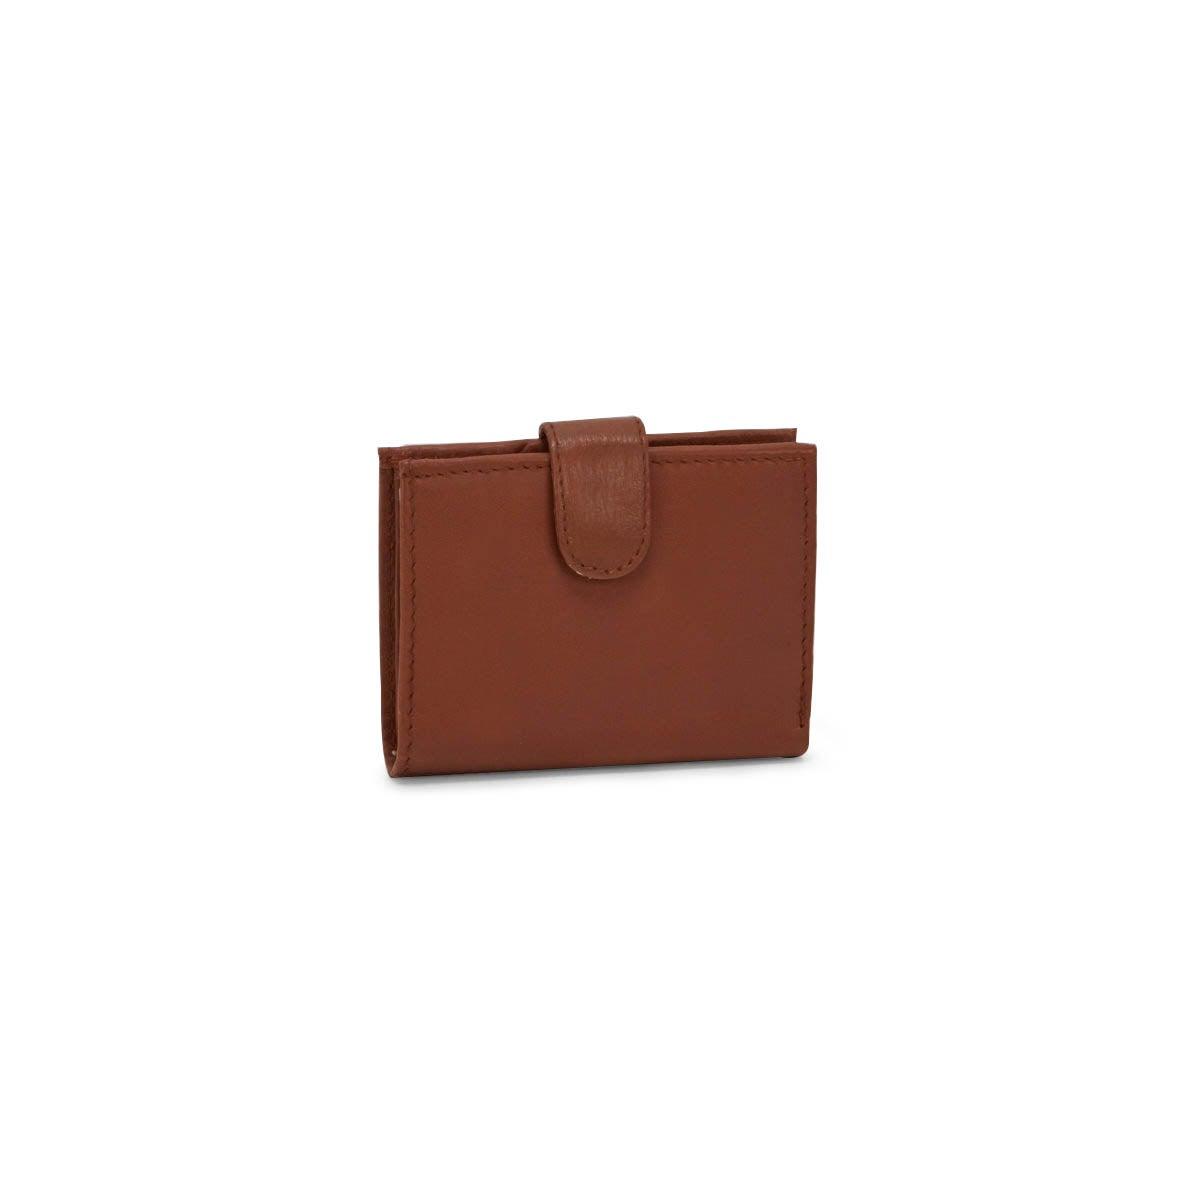 Mns tan RFID cardholder wallet